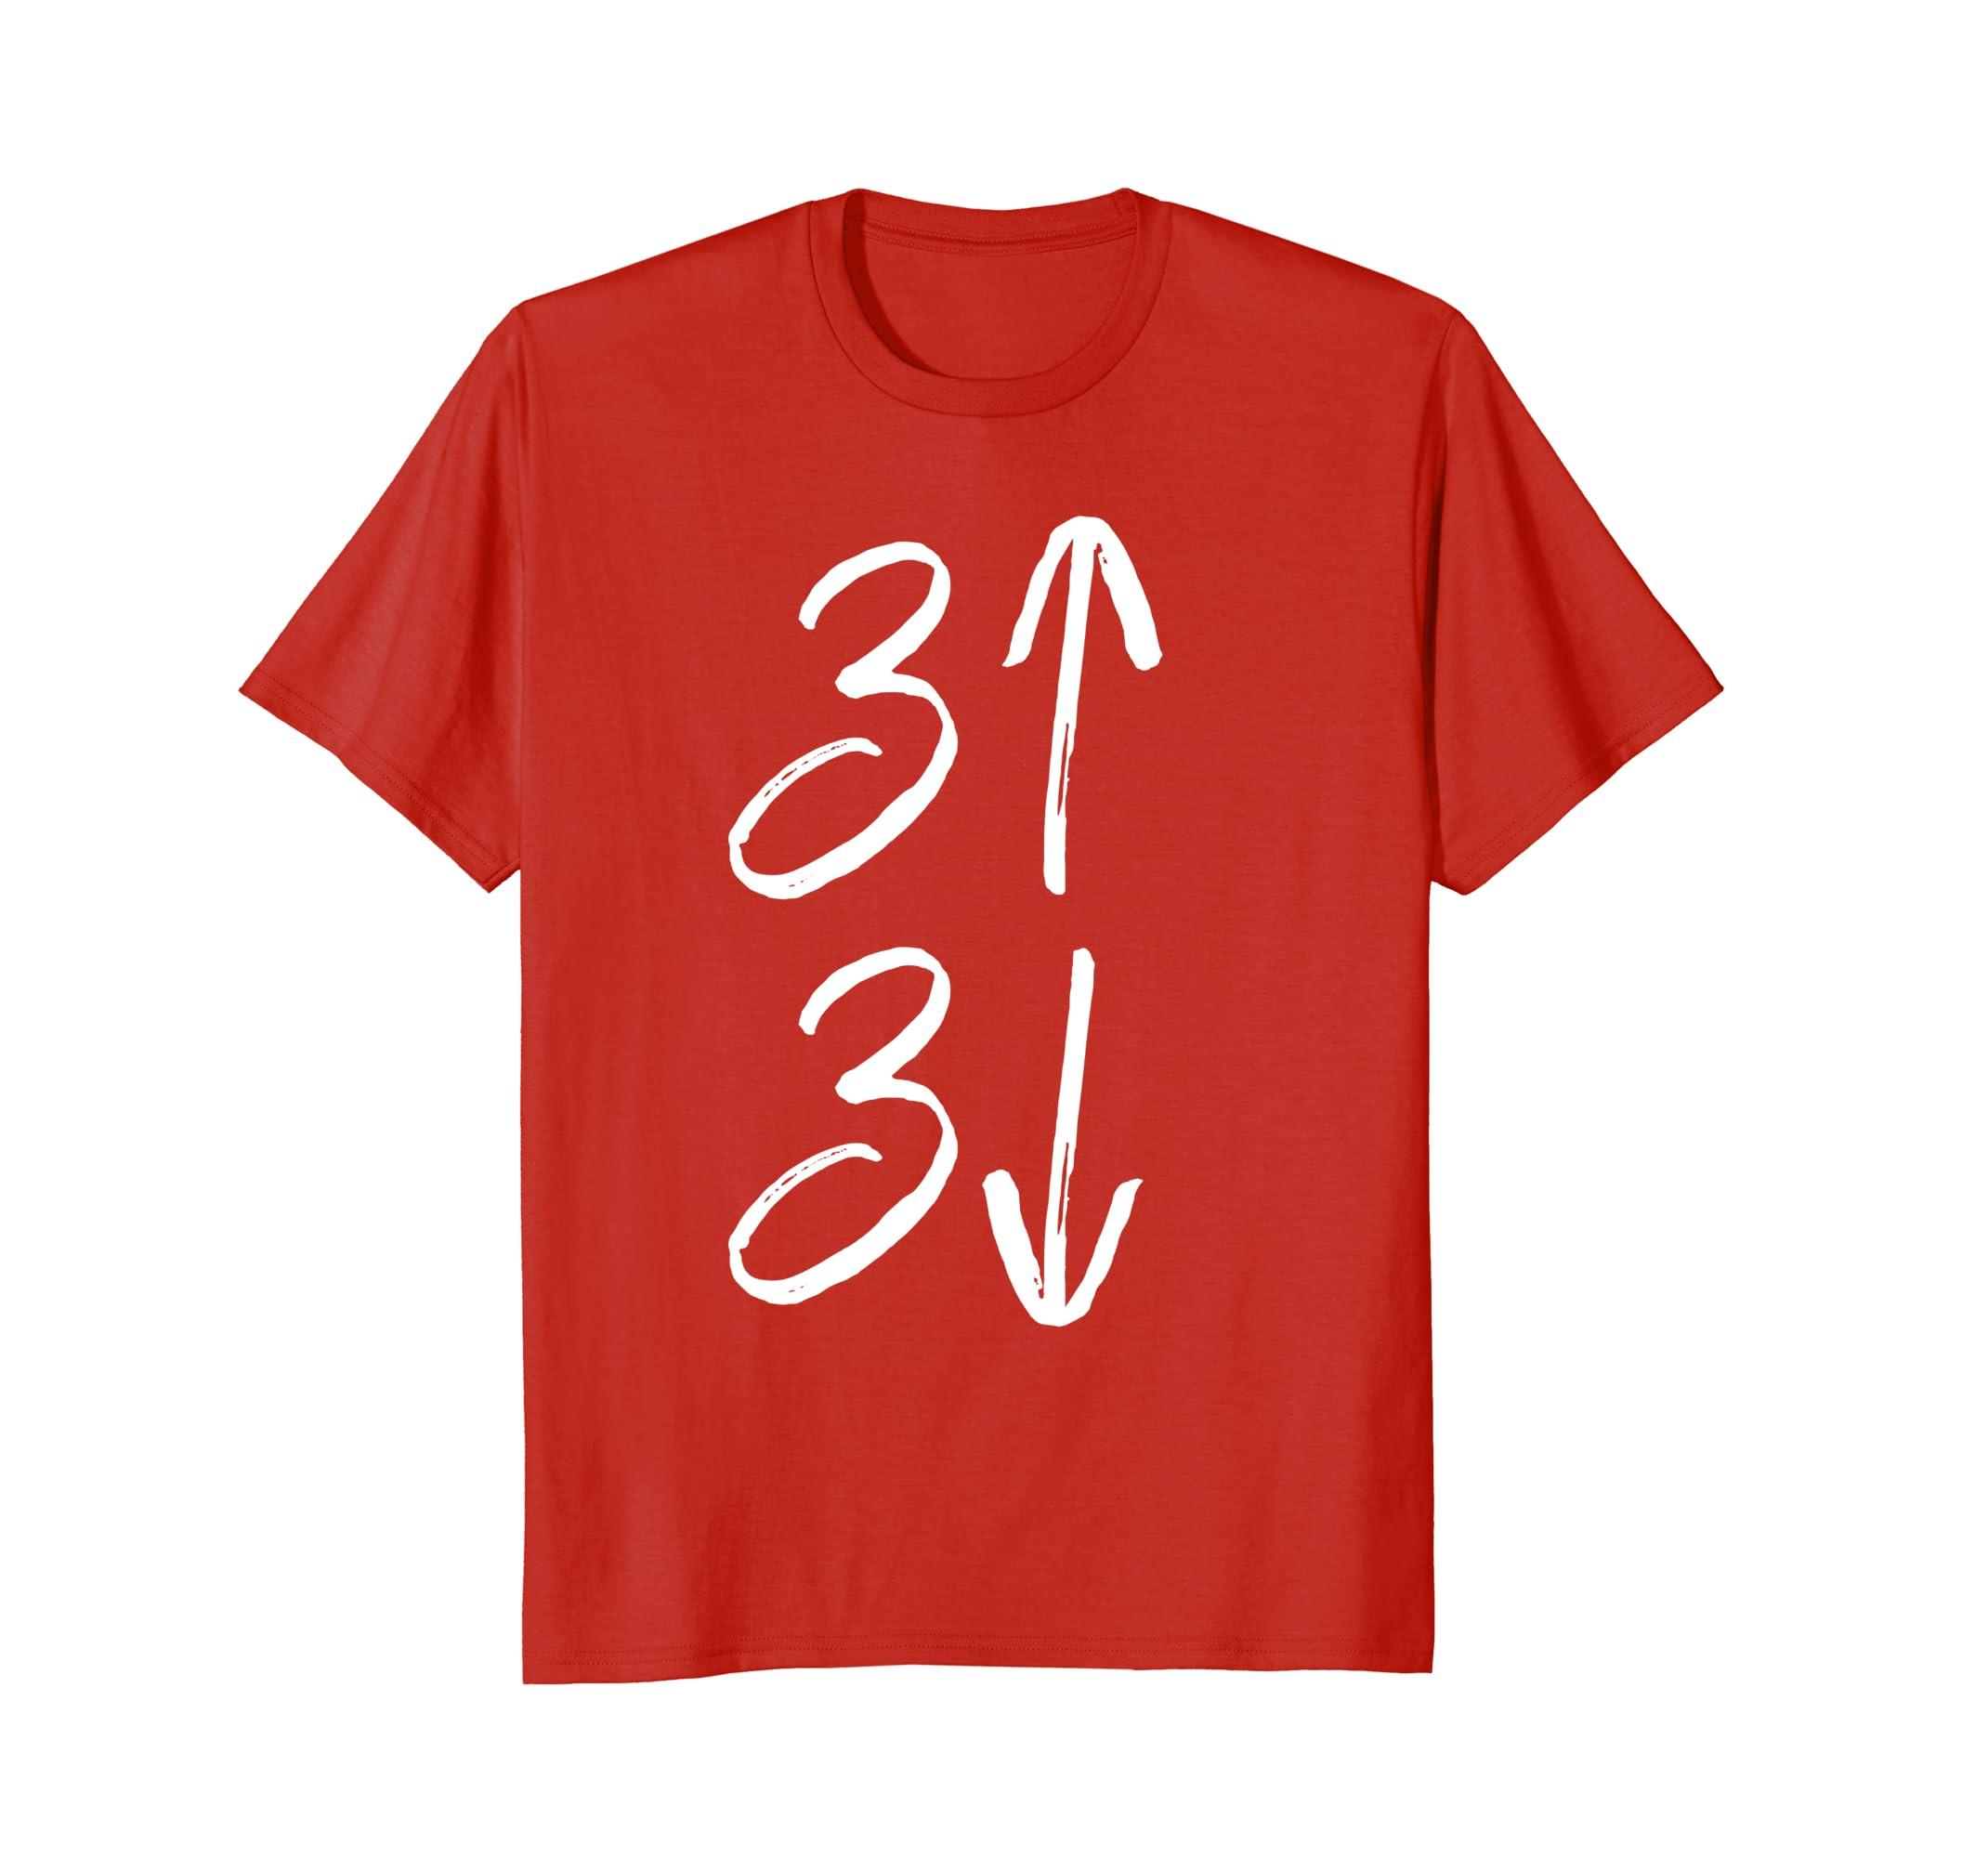 3 Up 3 Down Shirt Fun Cute Baseball Shirt for Moms & Dads-anz